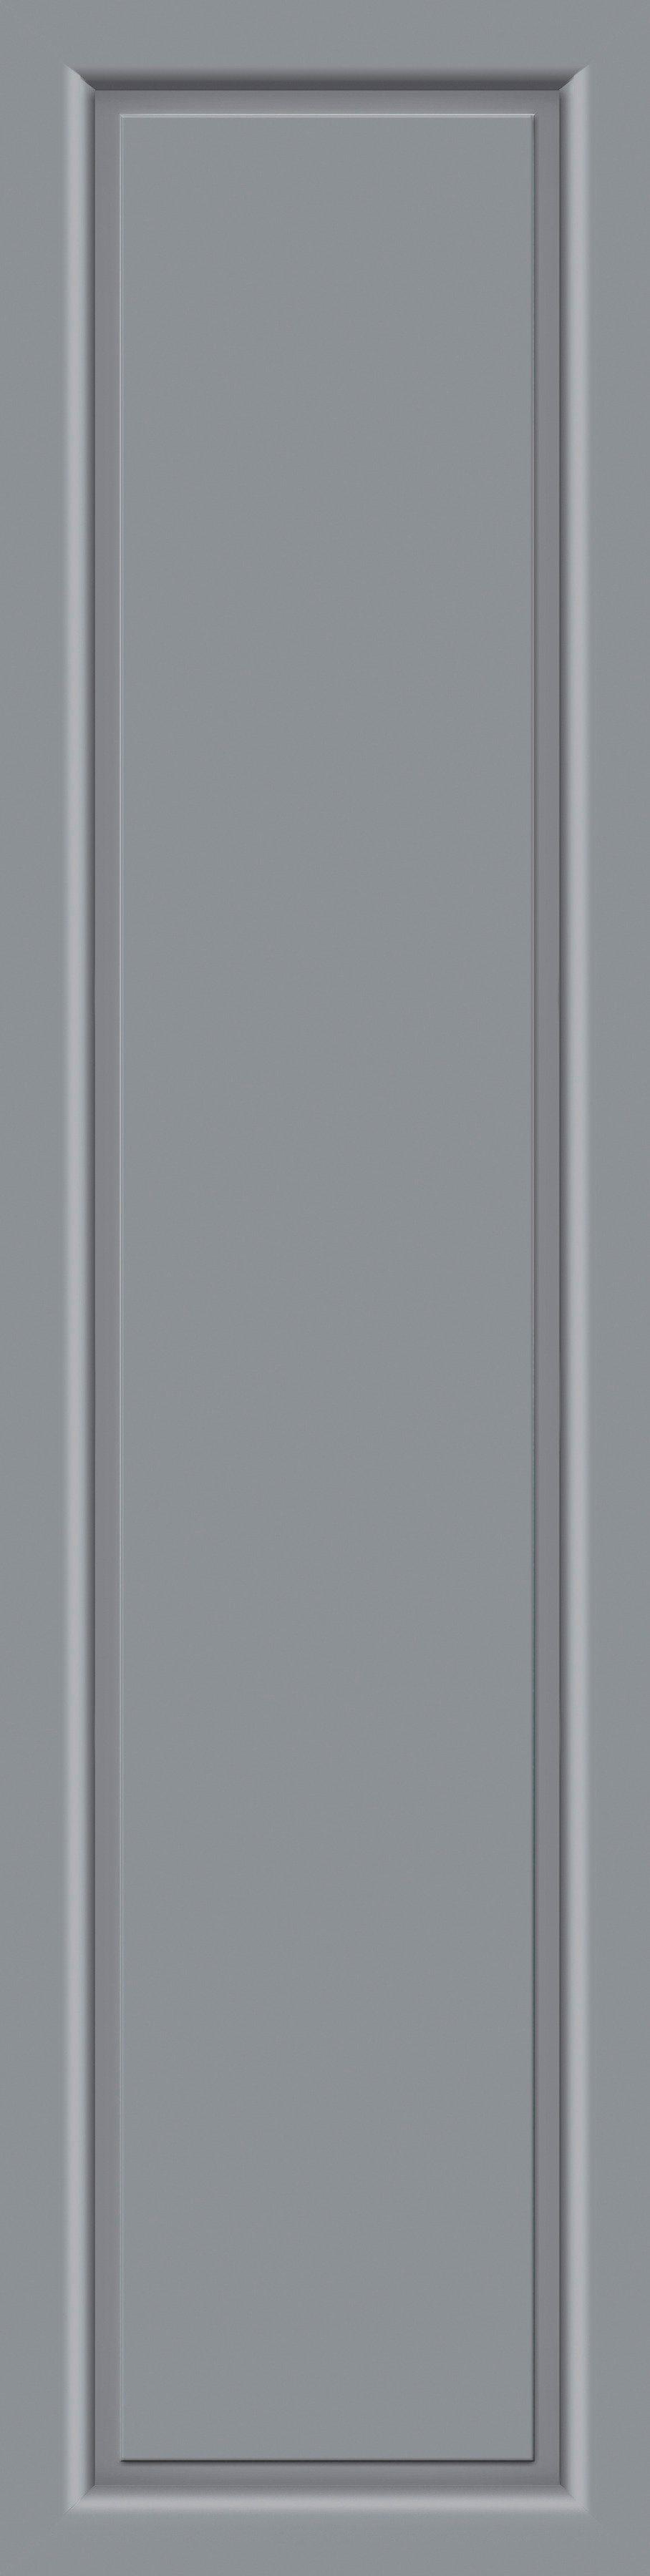 KM MEETH ZAUN GMBH Seitenteile »S04«, für Alu-Haustür, BxH: 50x198 cm, grau